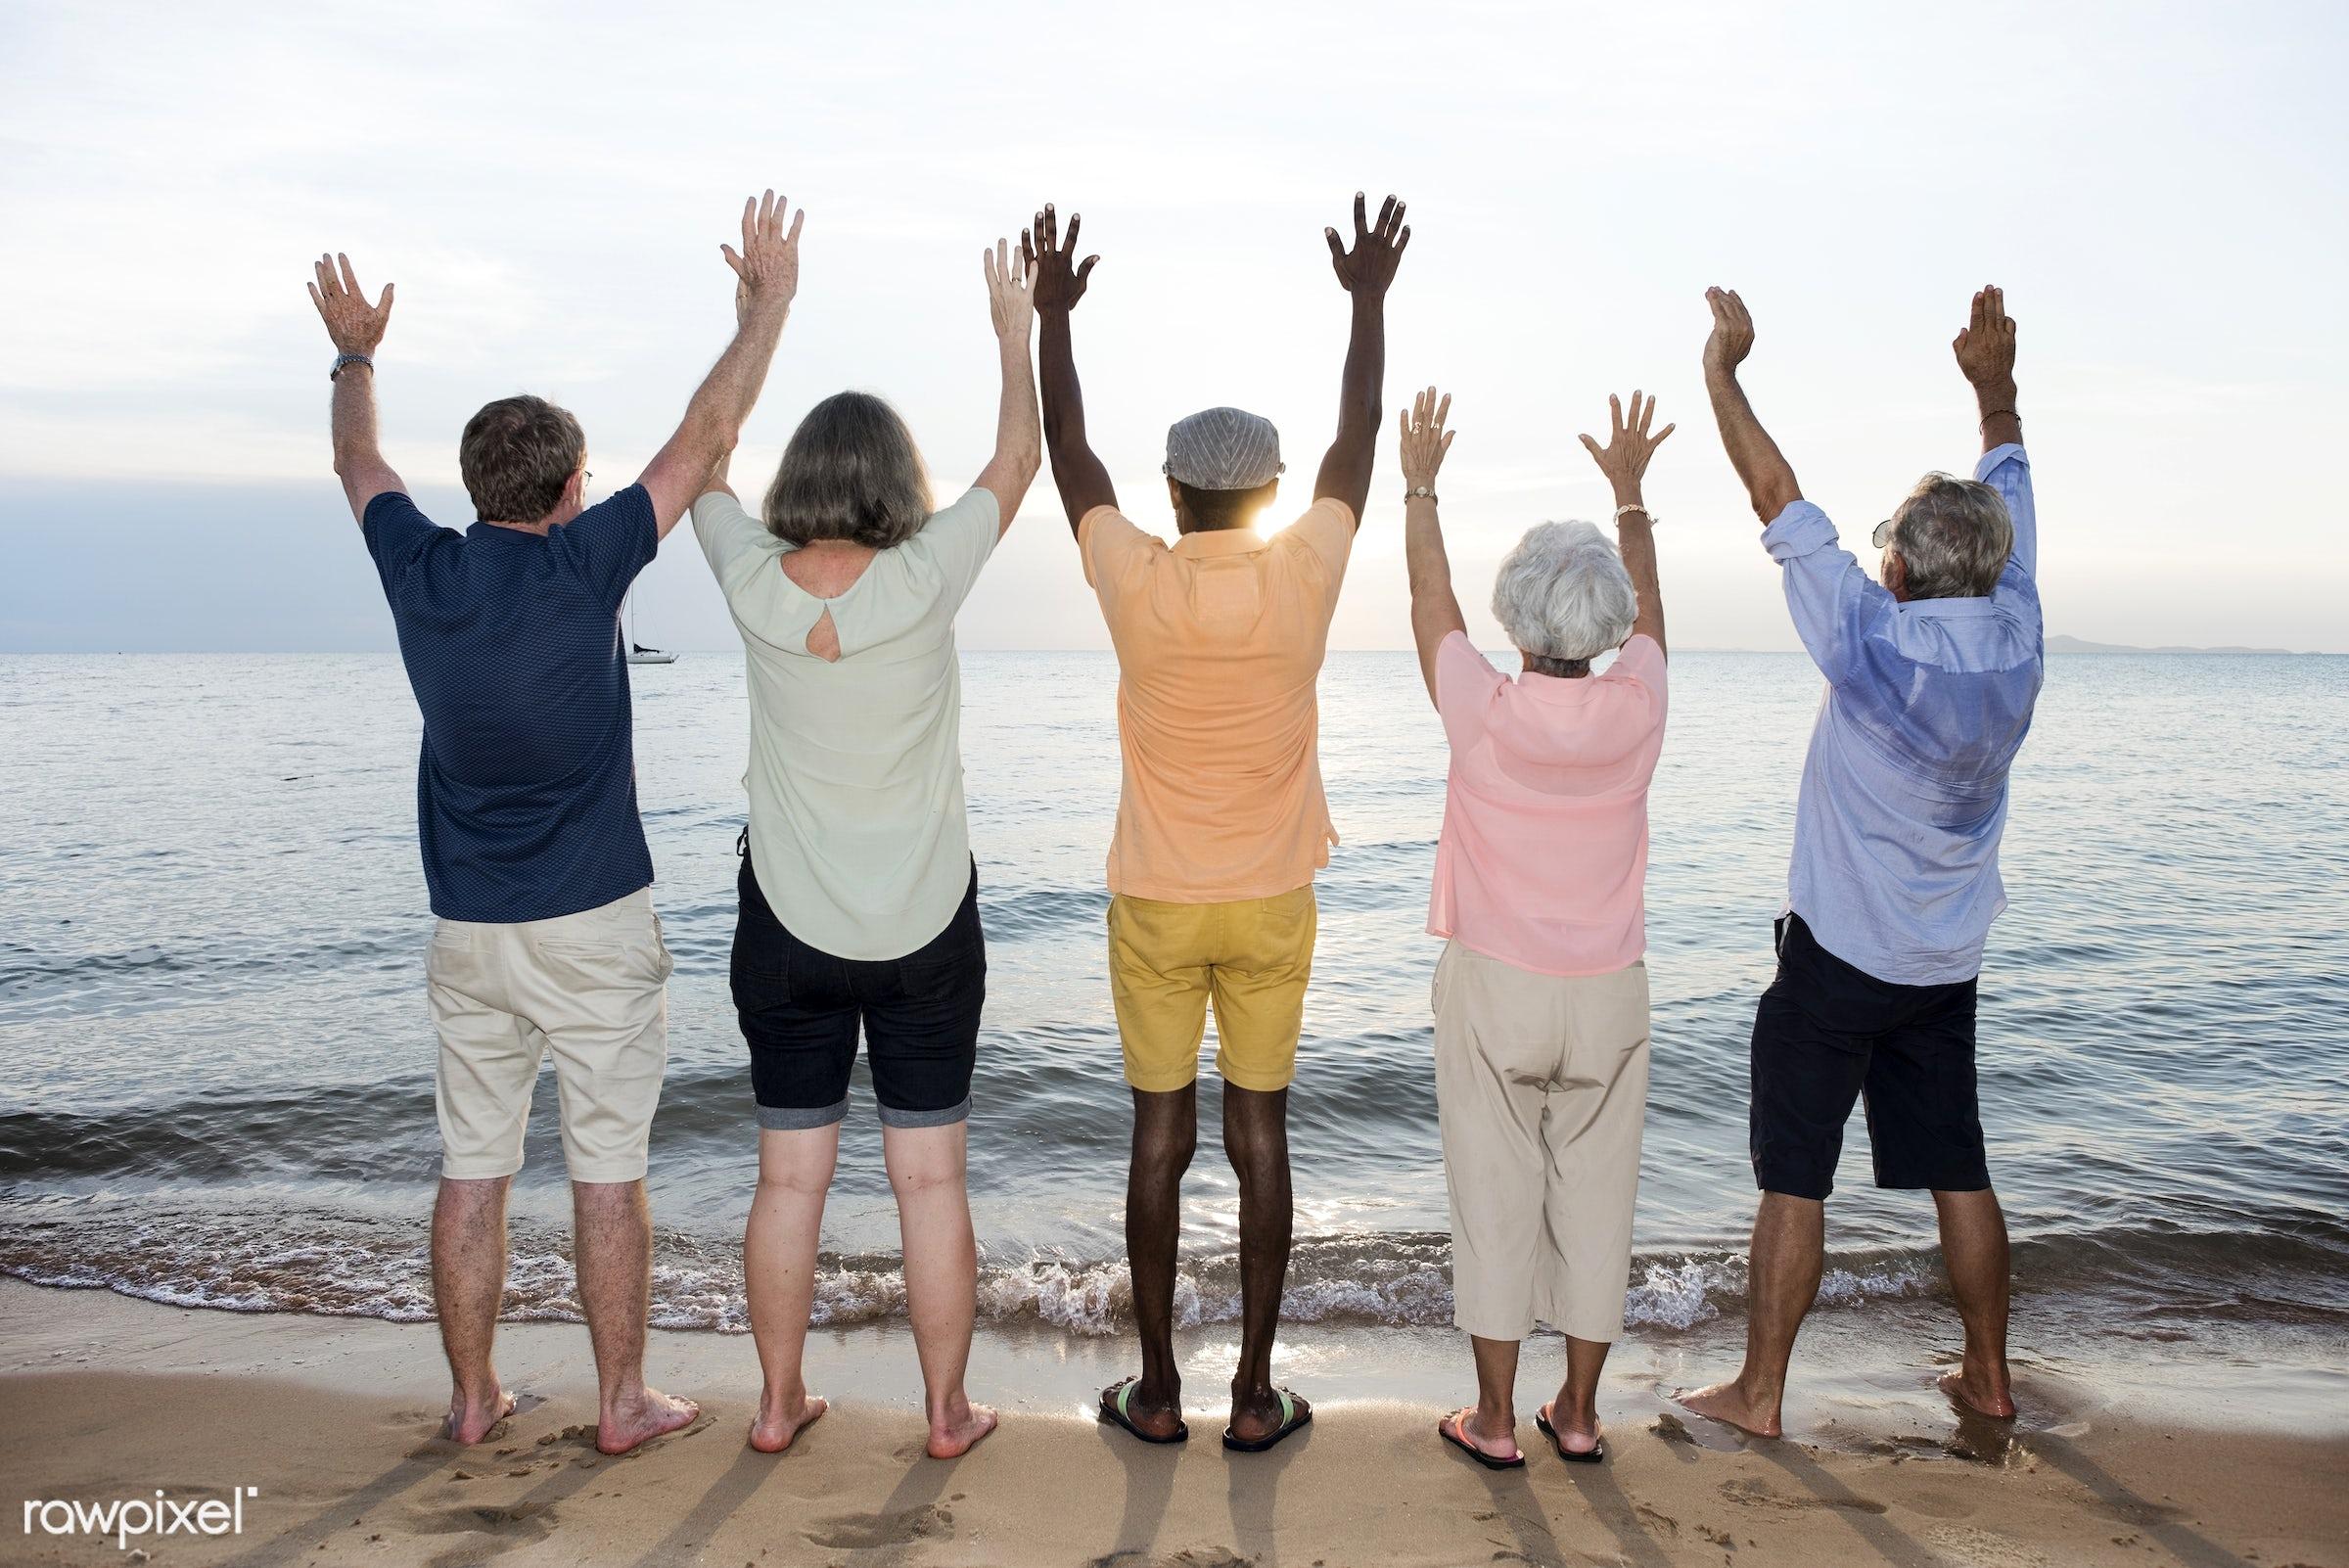 arms raised, beach, break, cheerful, coast, diverse, elderly, family, freedom, friends, friendship, fun, gesture, group,...